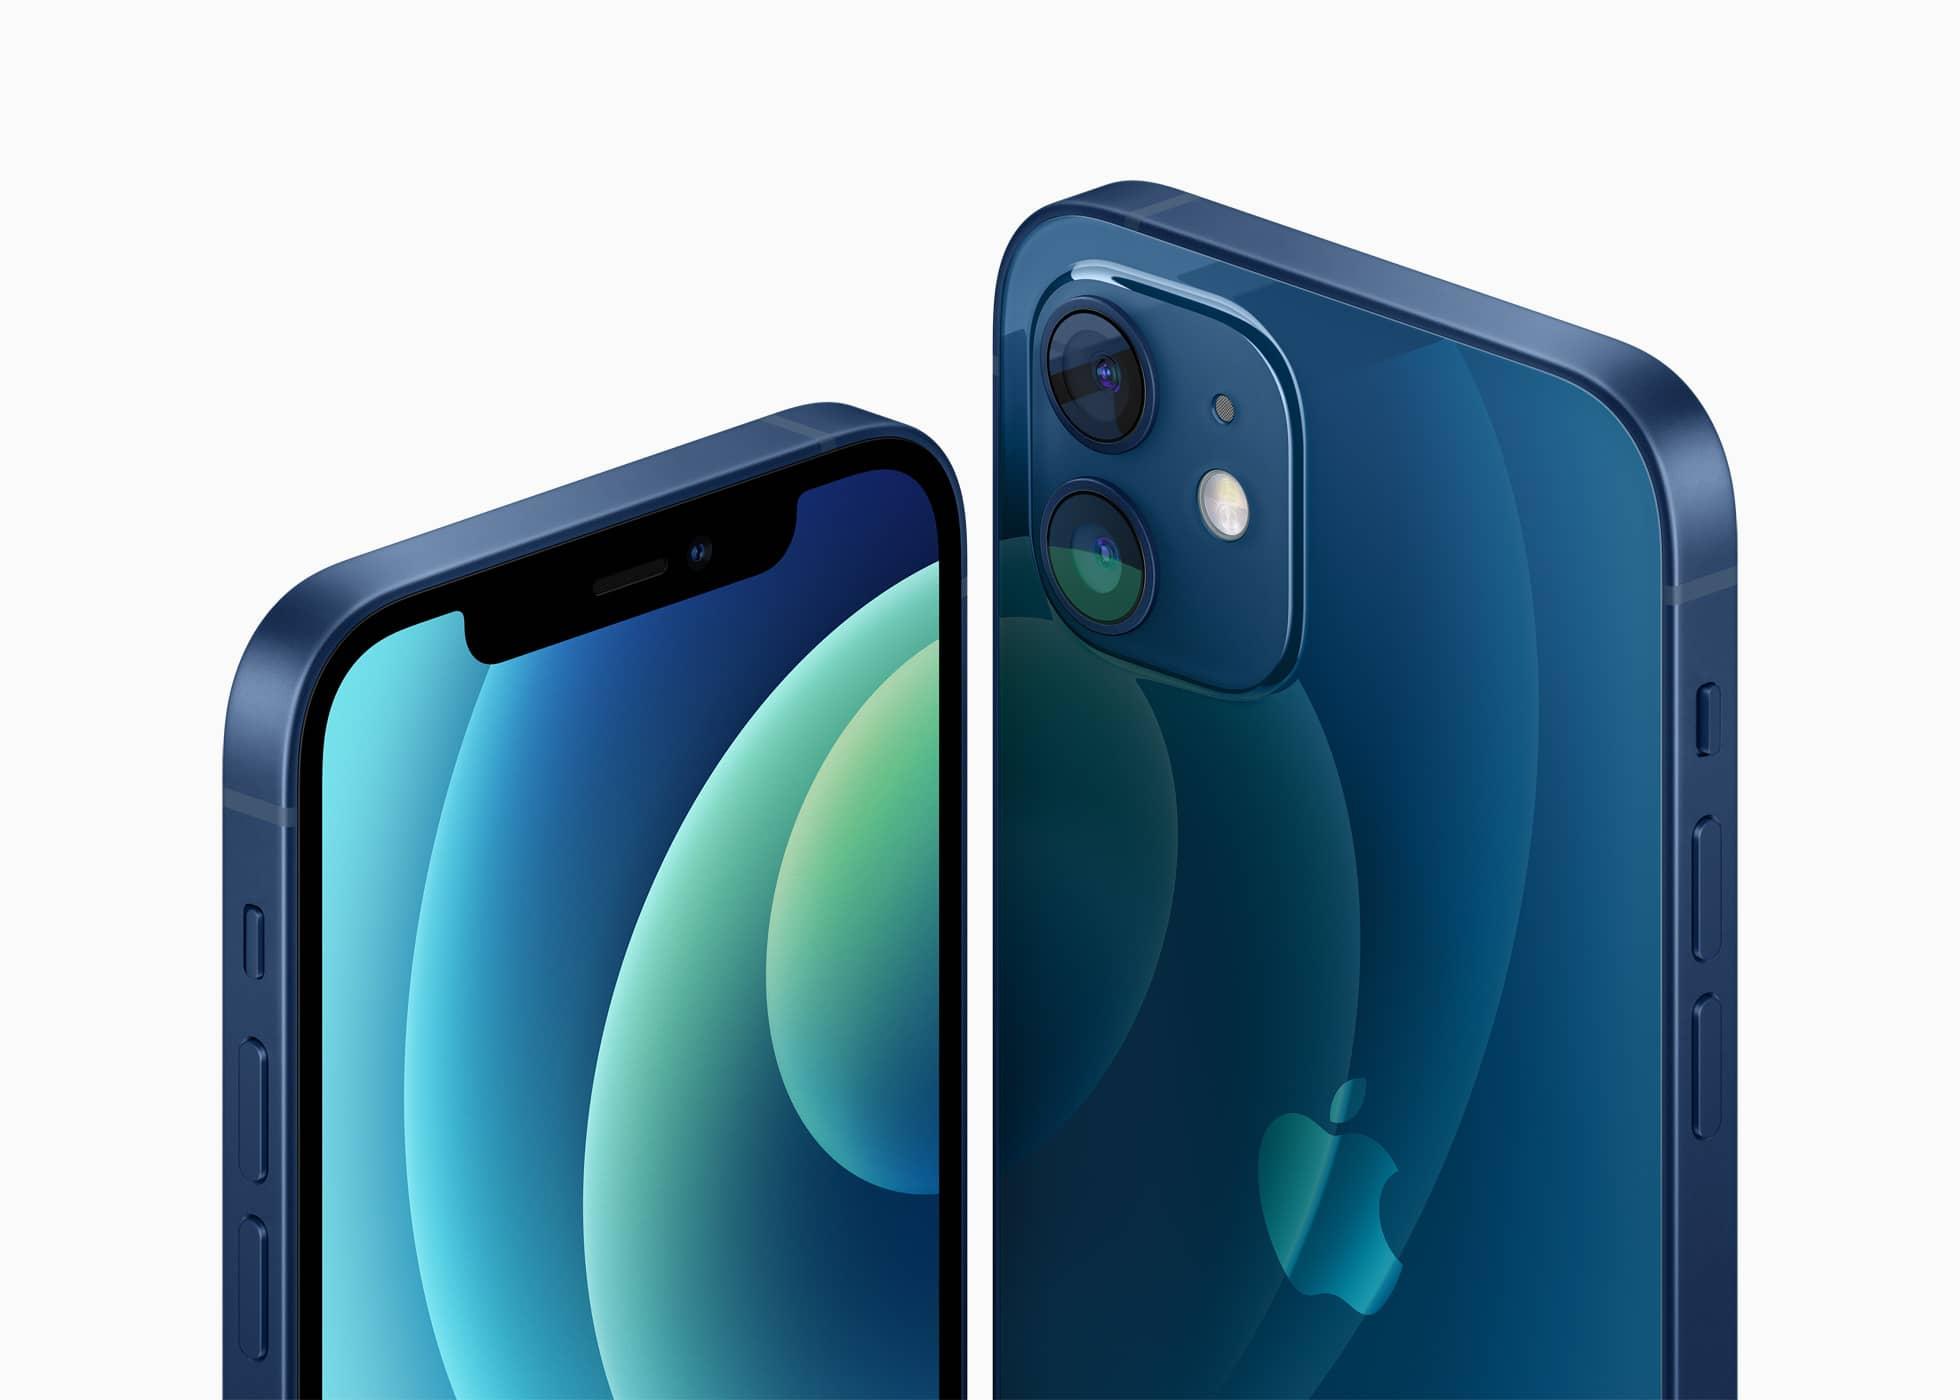 apple iphone 12 color blue 10132020